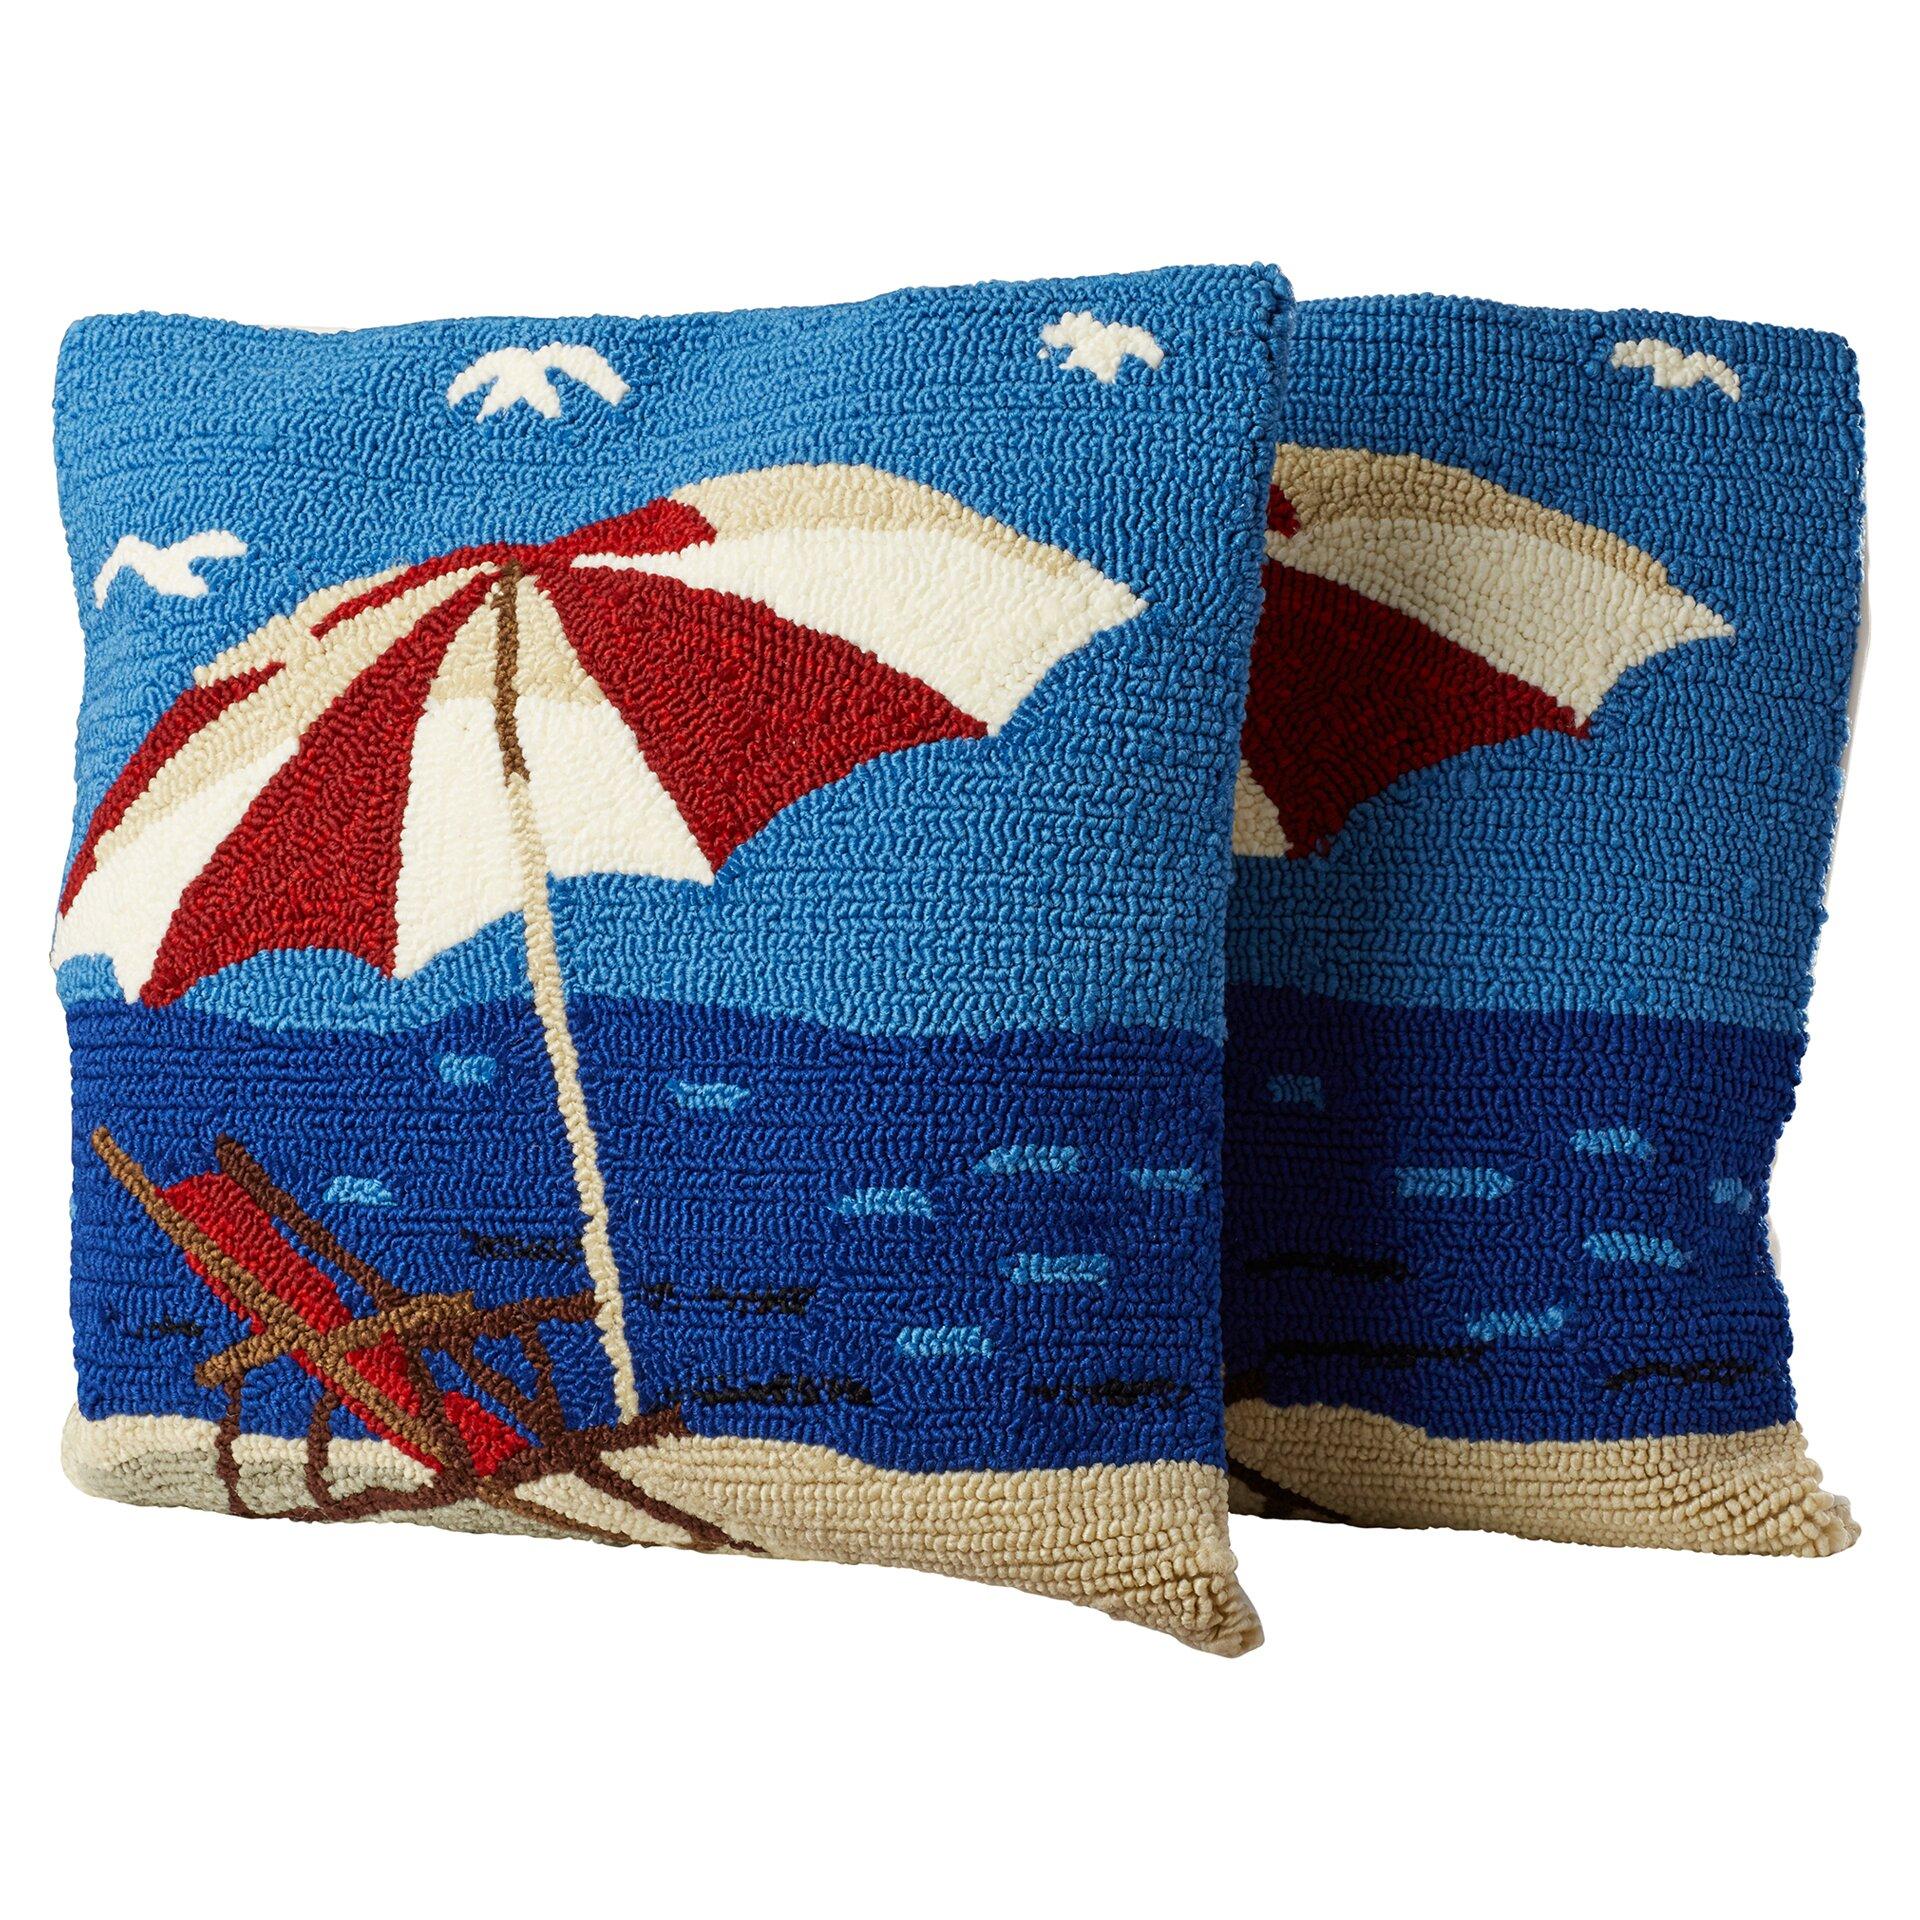 Decorative Outdoor Throw Pillows : Breakwater Bay Hendersonville Lounge Decorative Indoor/Outdoor Throw Pillow & Reviews Wayfair